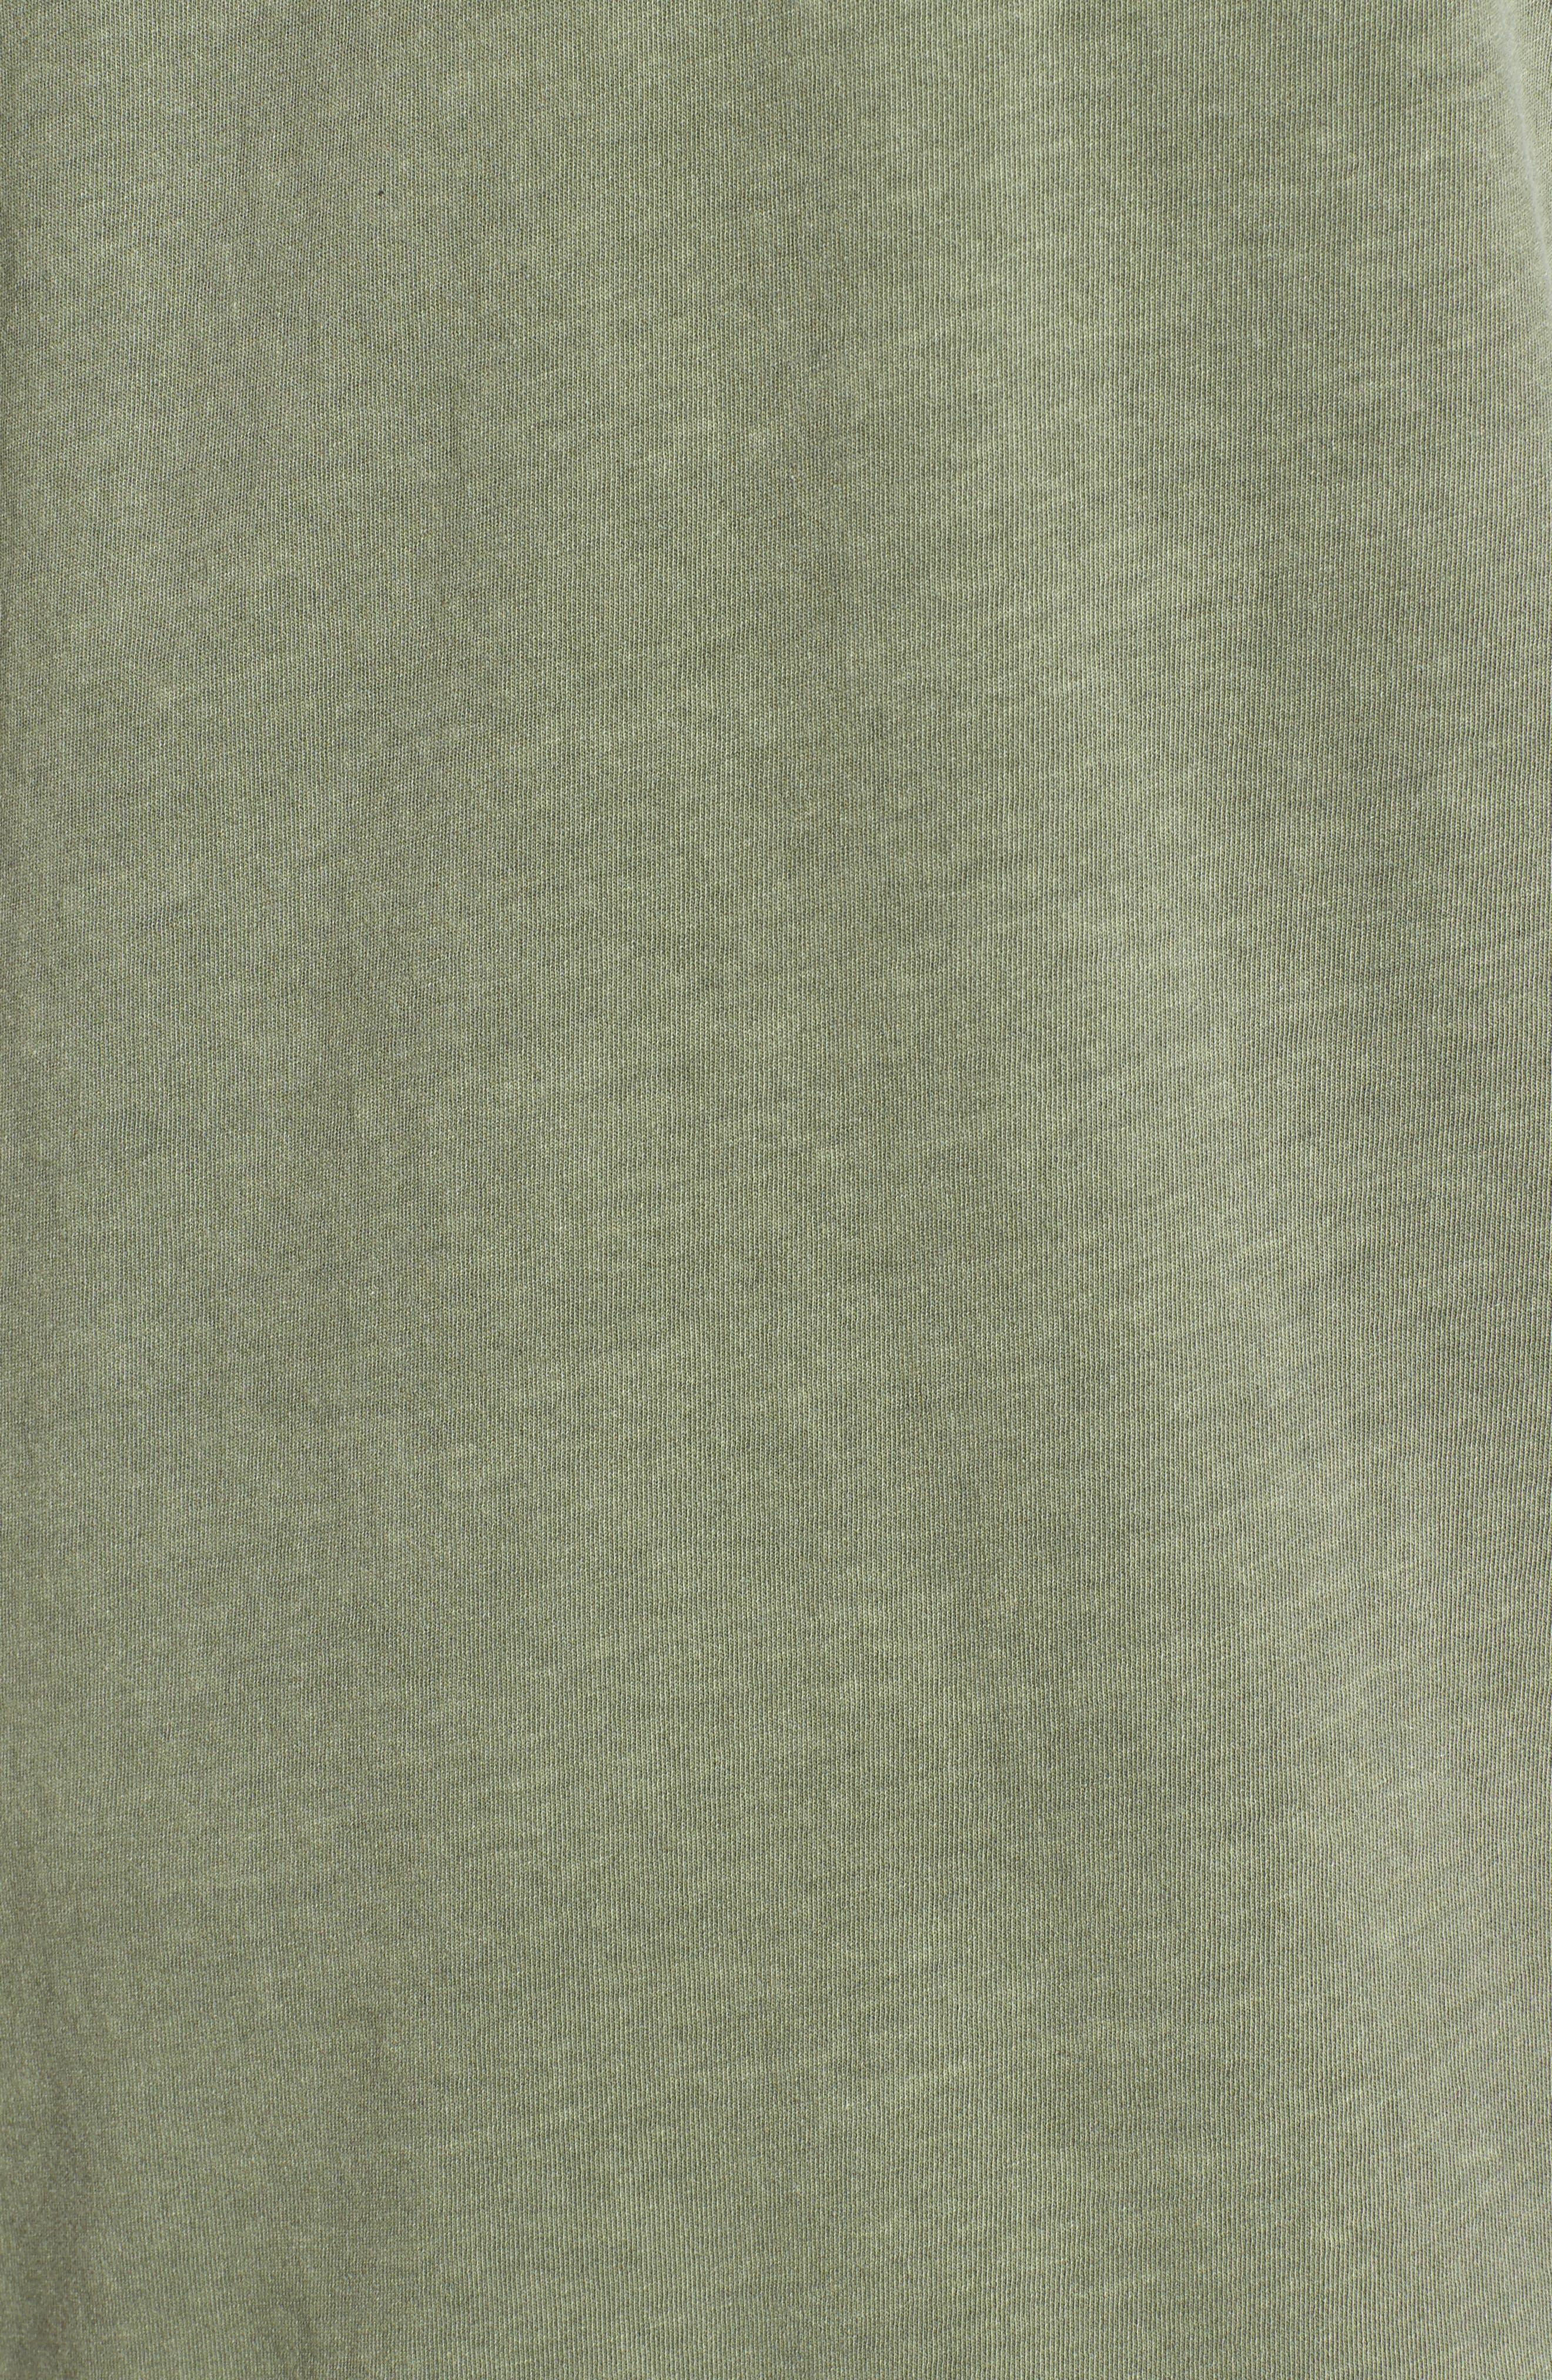 Fillmore Street Vintage Graphic T-Shirt,                             Alternate thumbnail 5, color,                             301